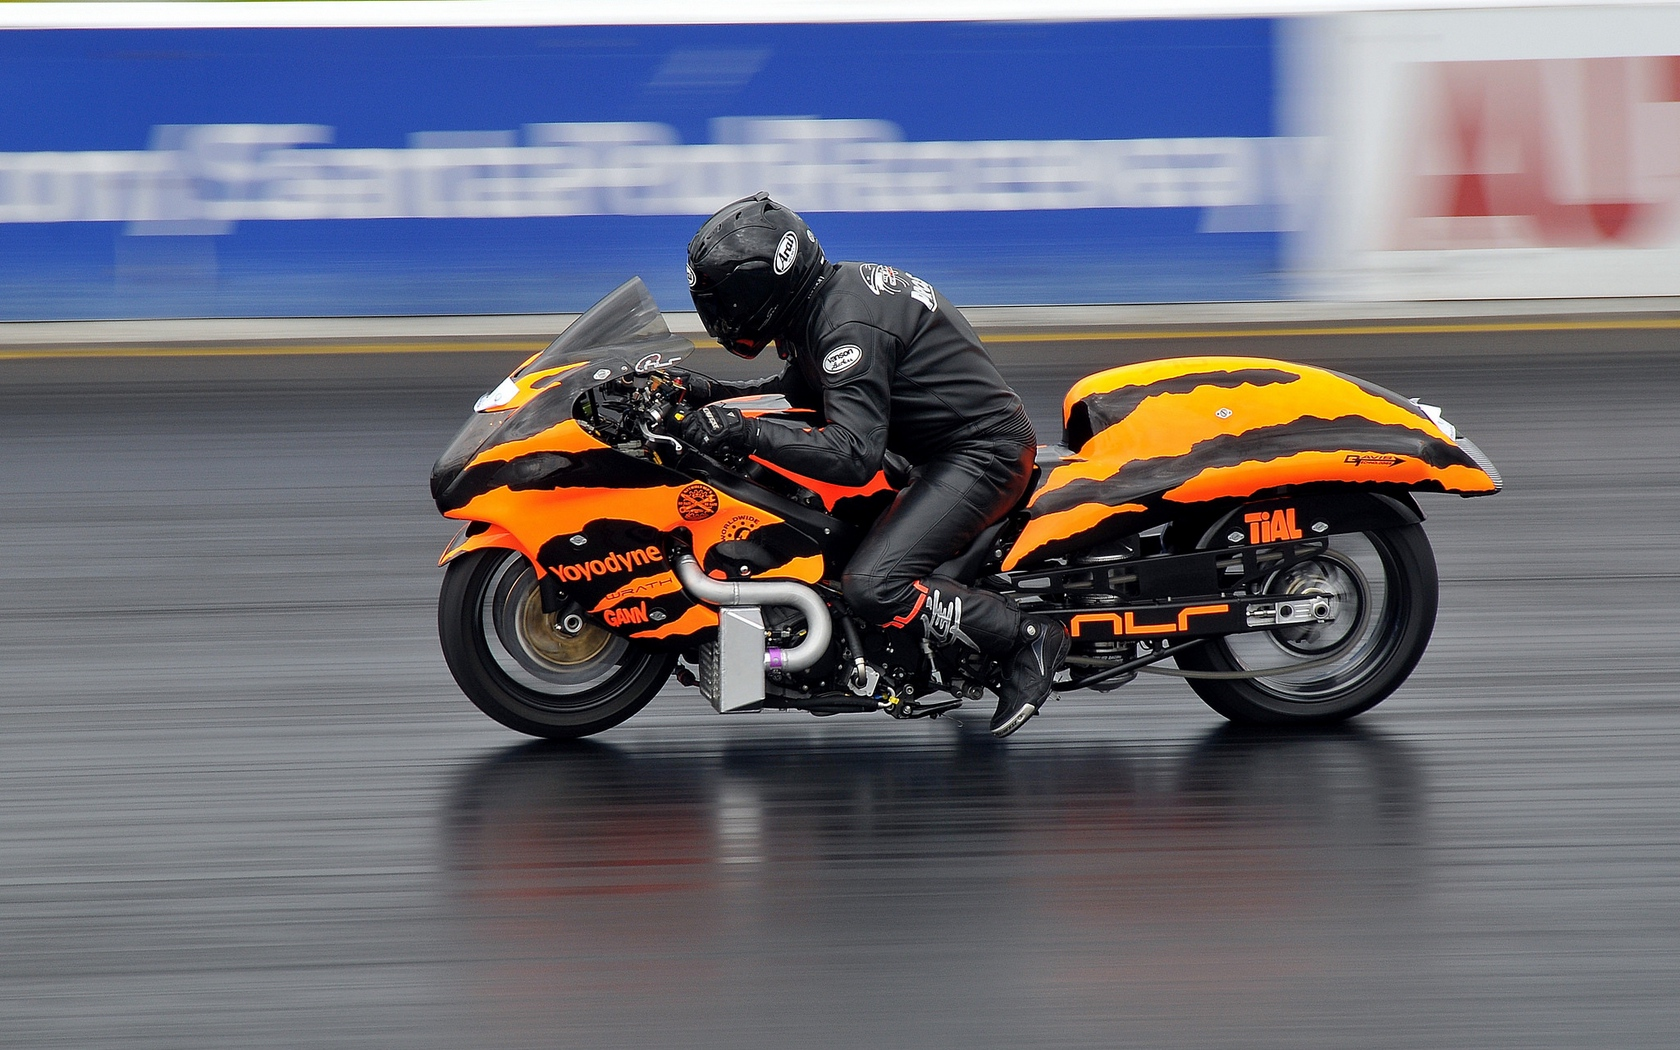 Download wallpaper 1680x1050 motorcycle bike racing sports 1680x1050